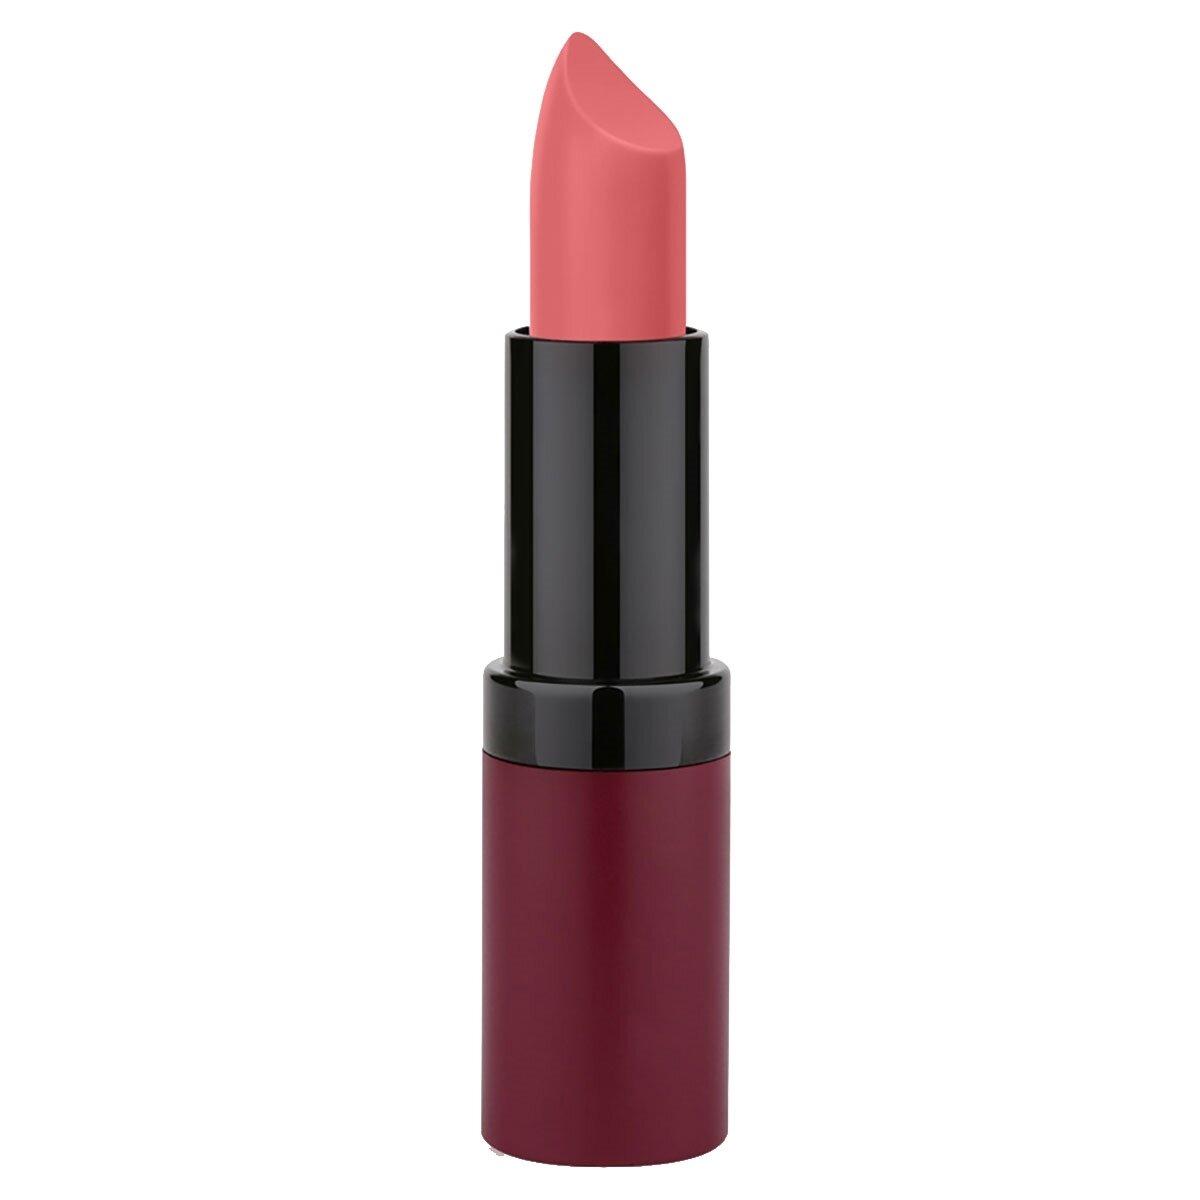 Velvet Matte Lipstick No:05